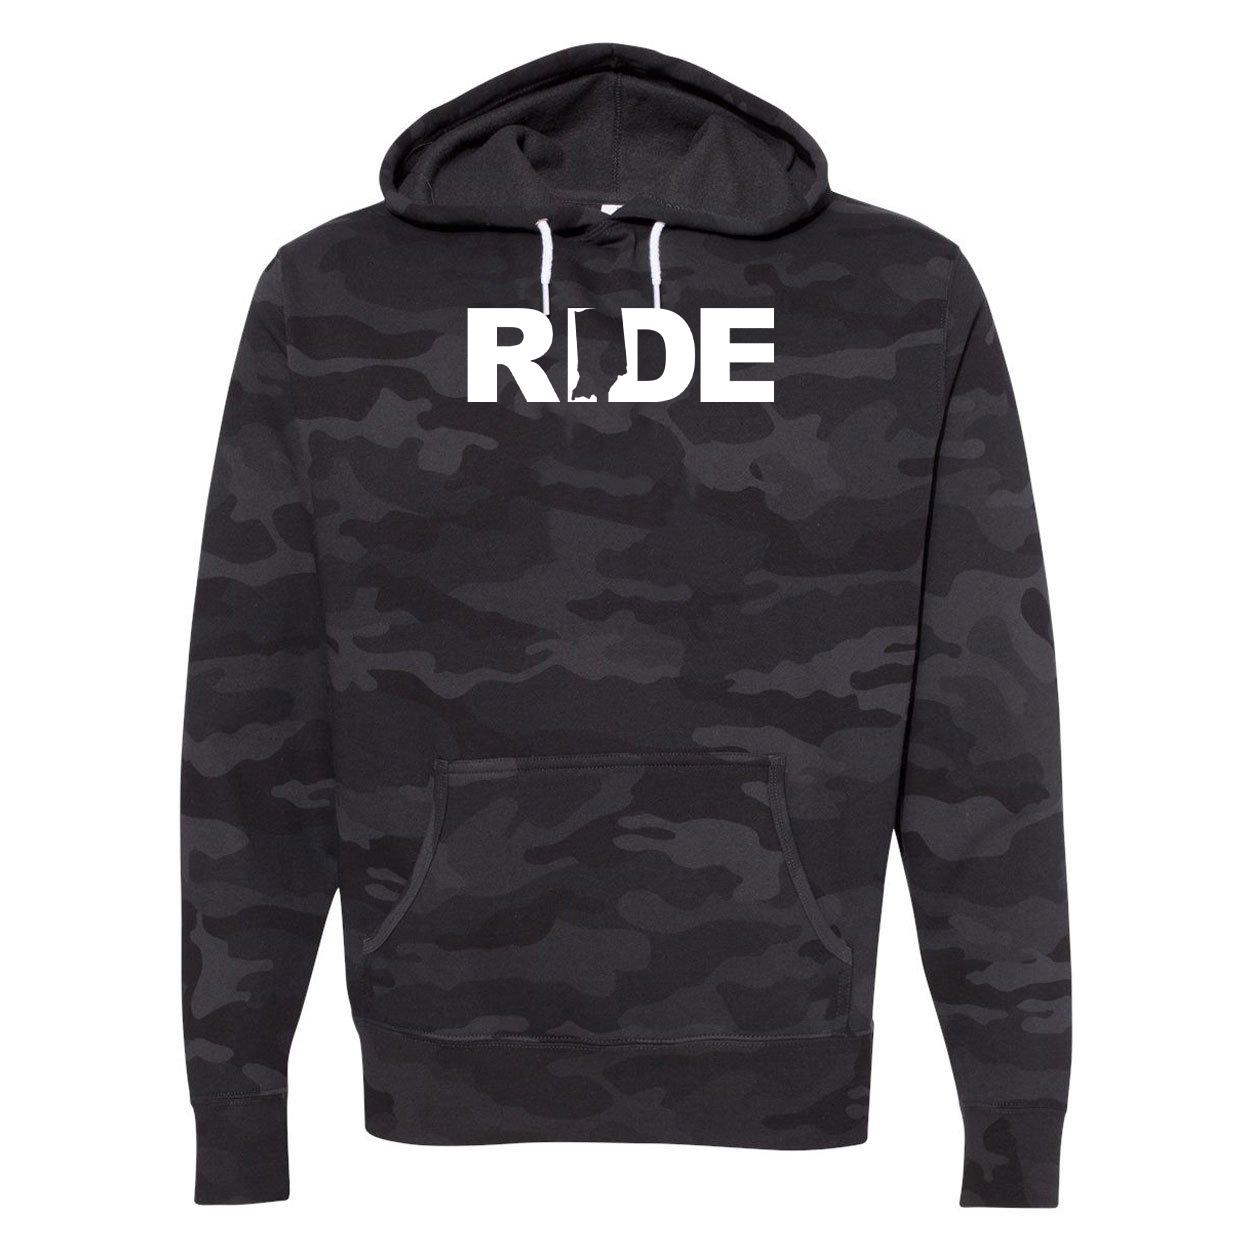 Ride Indiana Classic Unisex Hooded Sweatshirt Black Camo (White Logo)